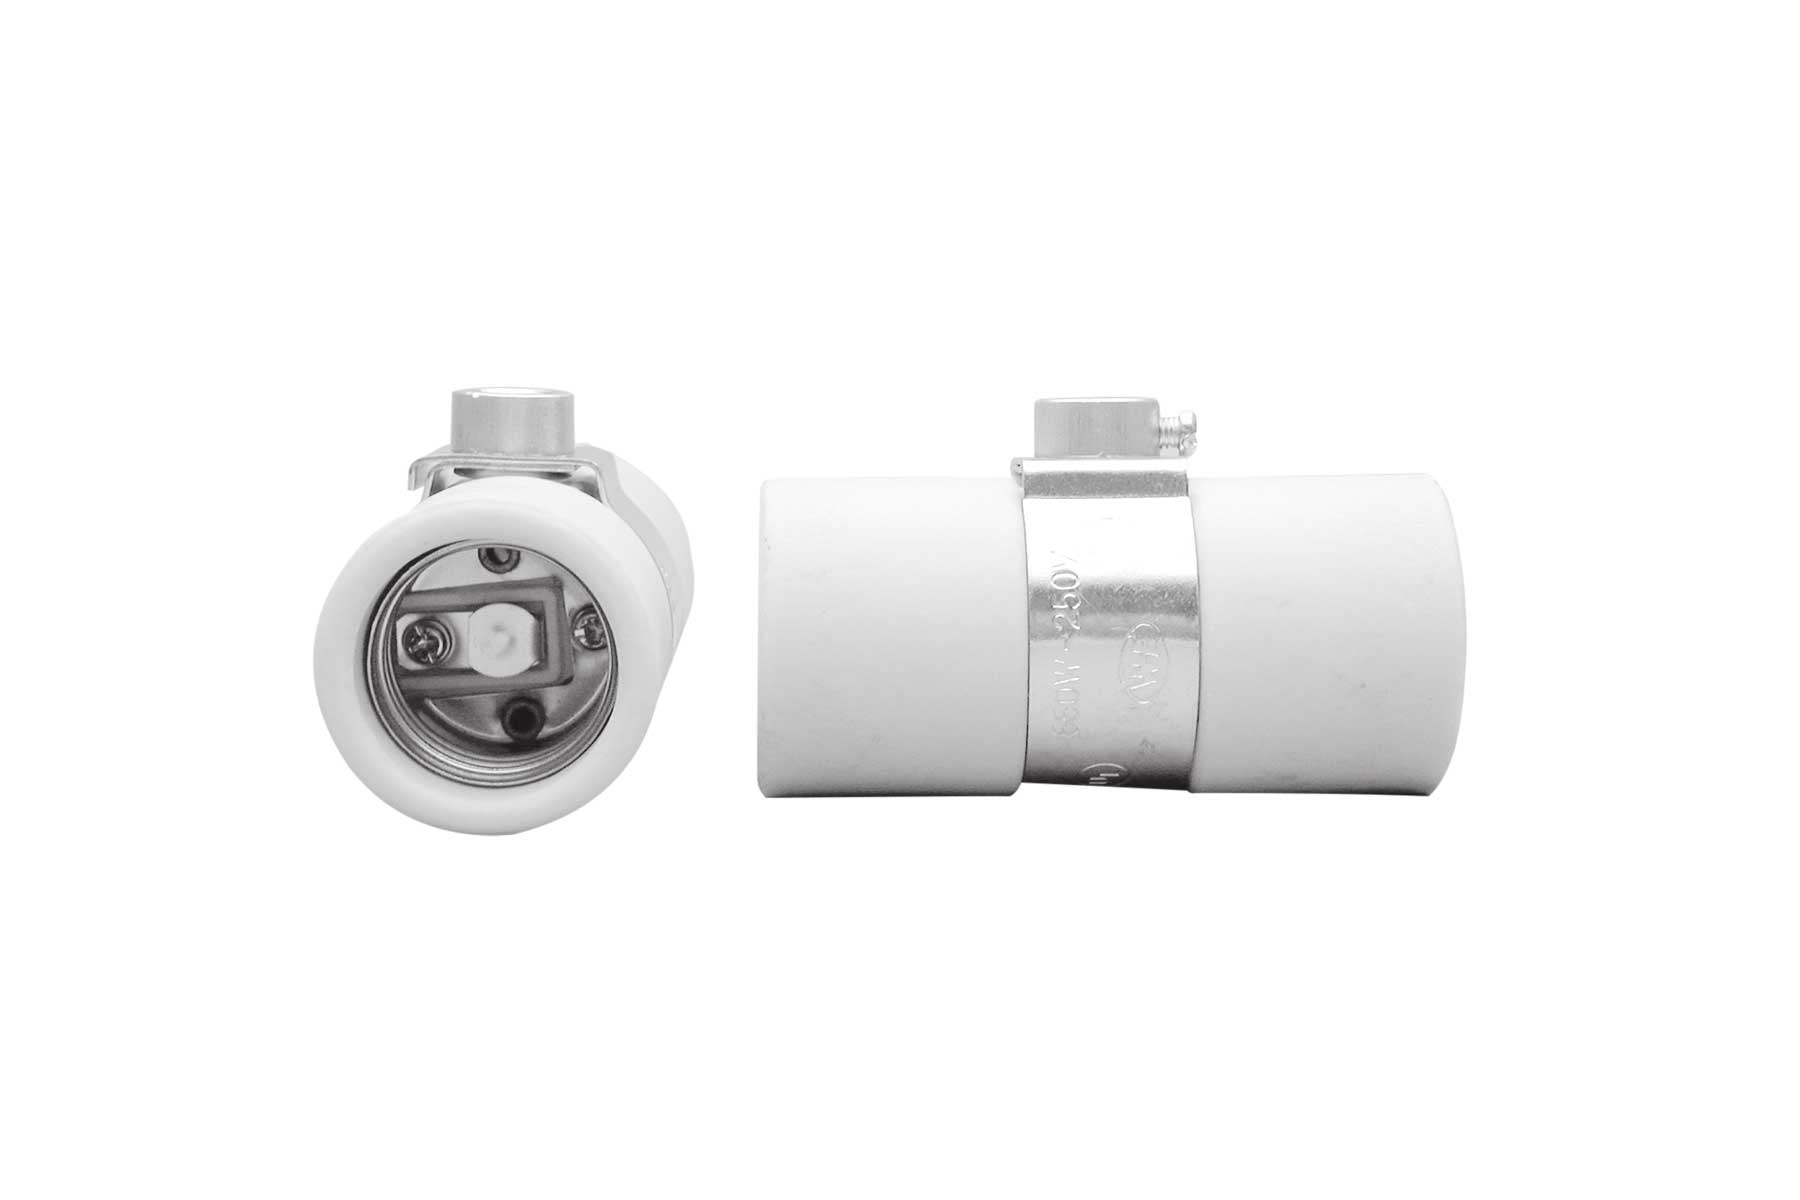 Medium Base Twin Porcelain Keyless Incandescent Light Socket